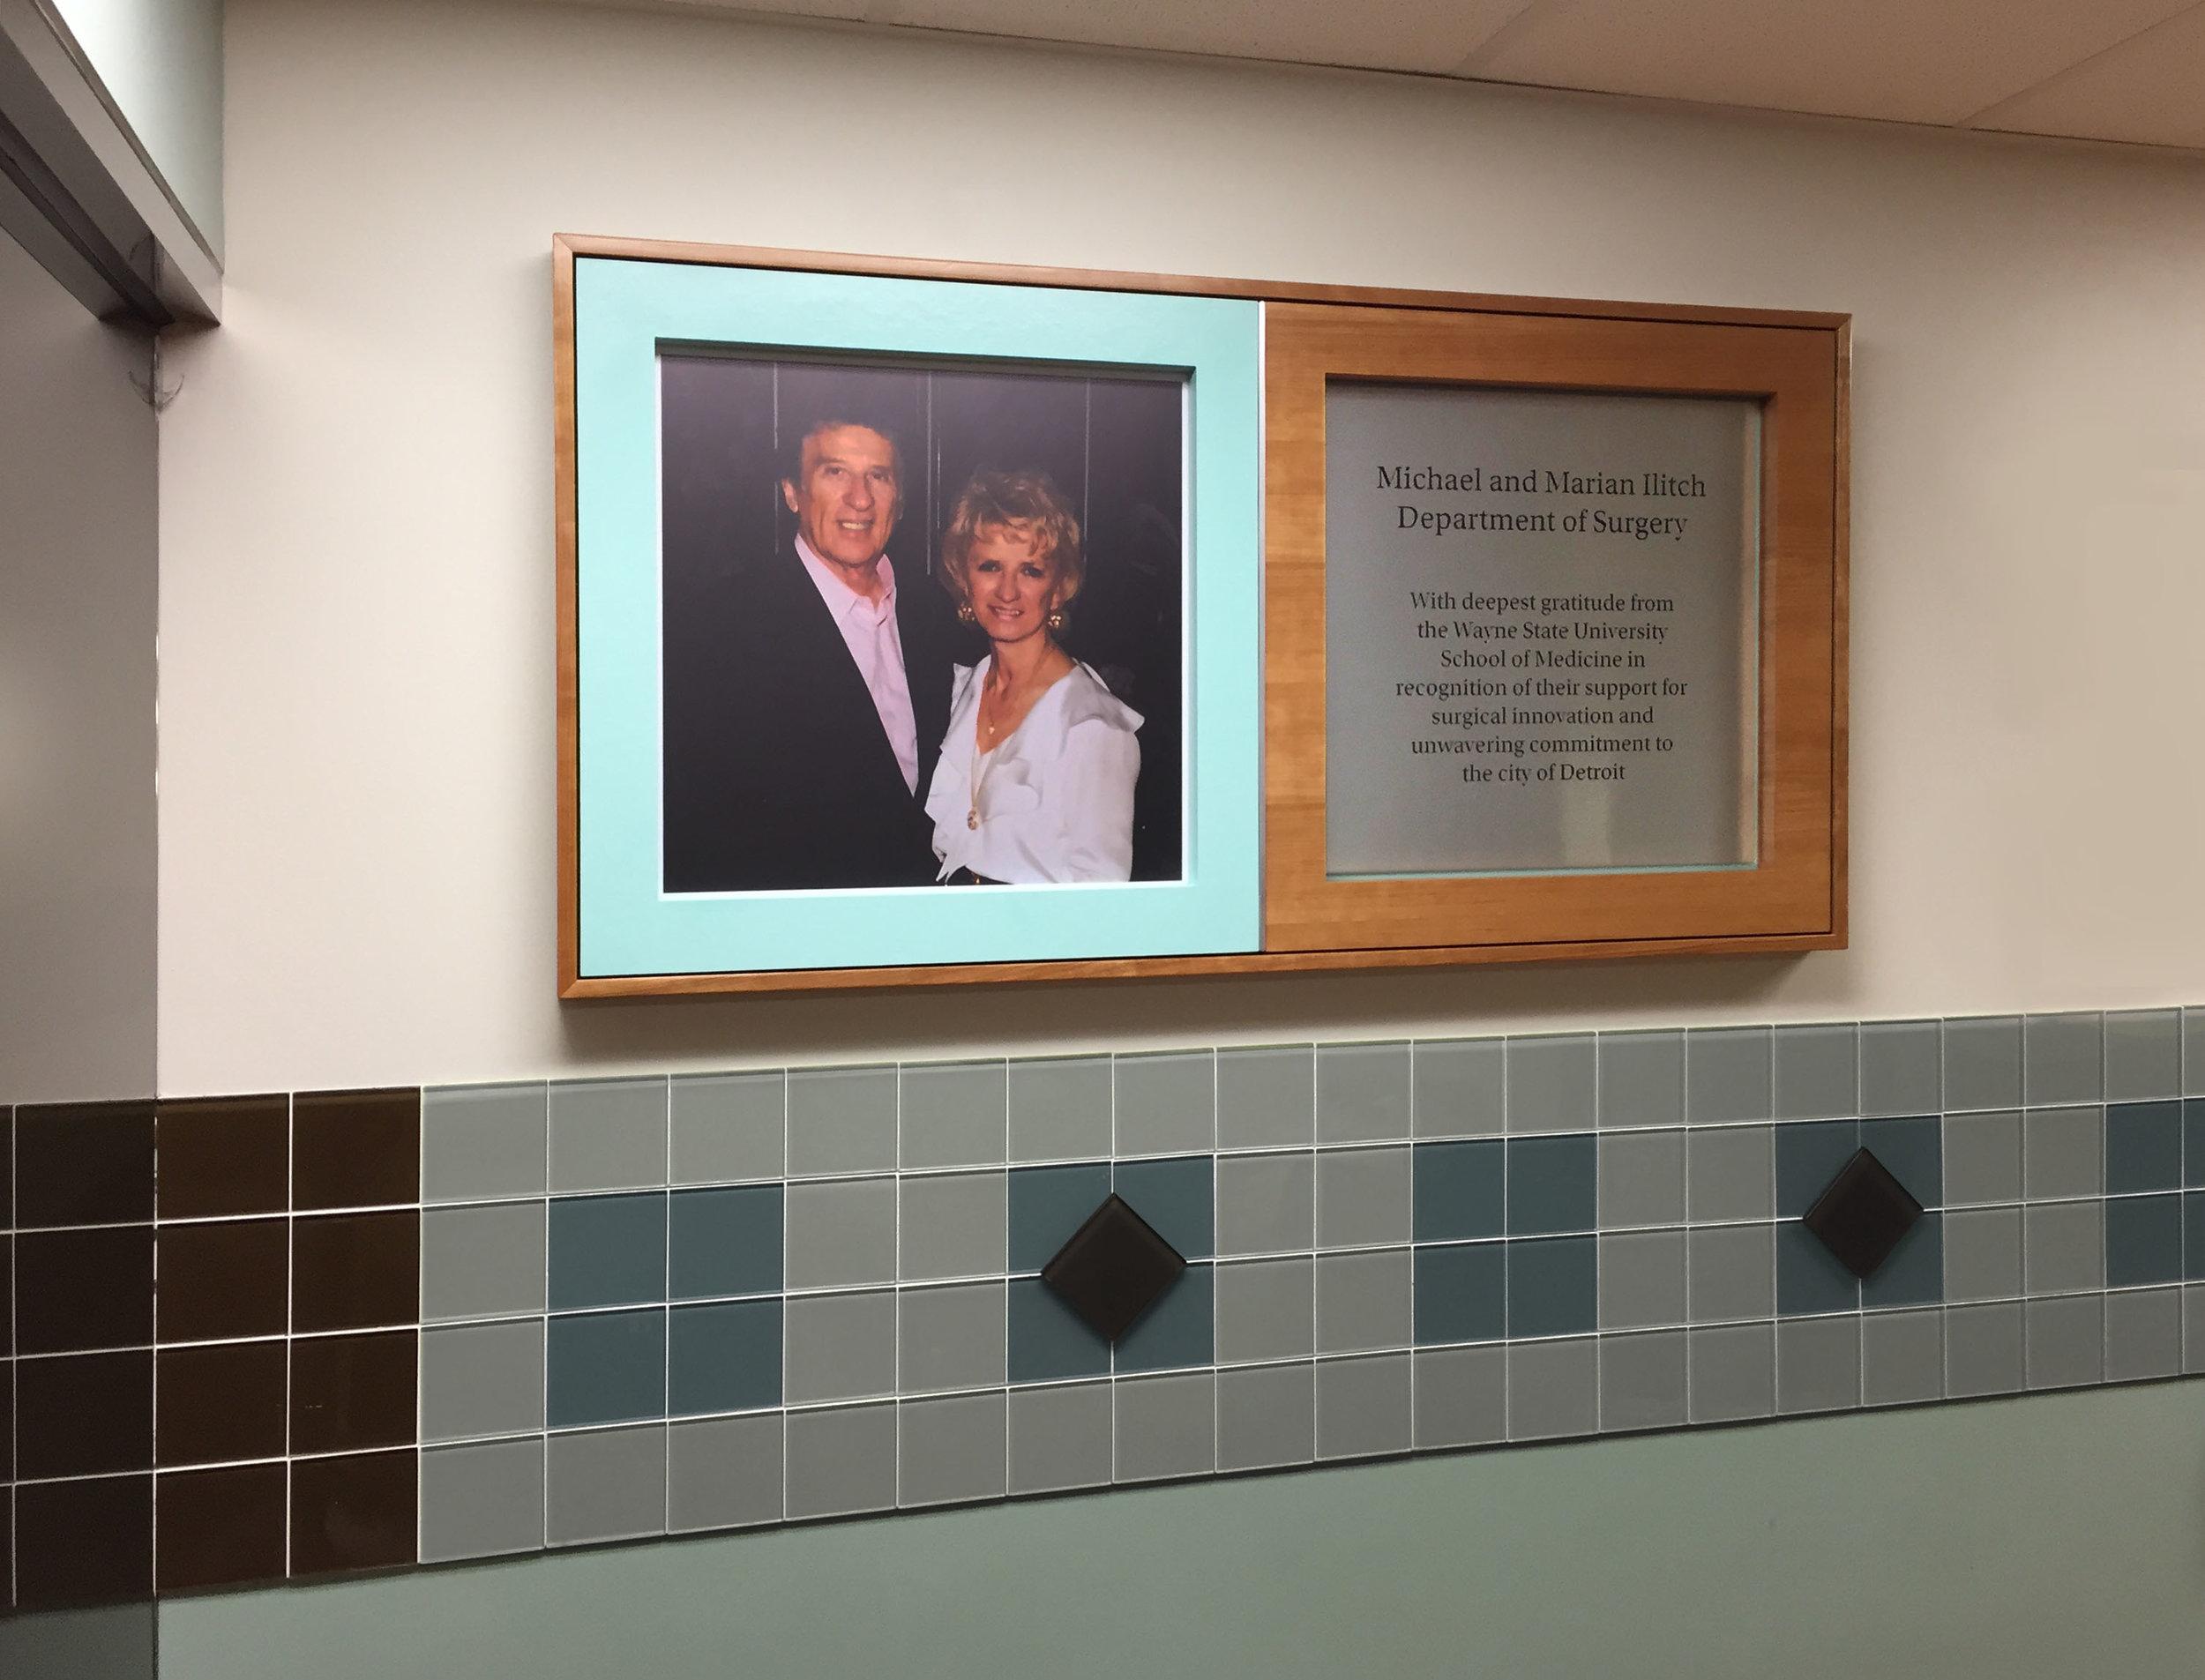 Exhibit Signage Recognizing Donors